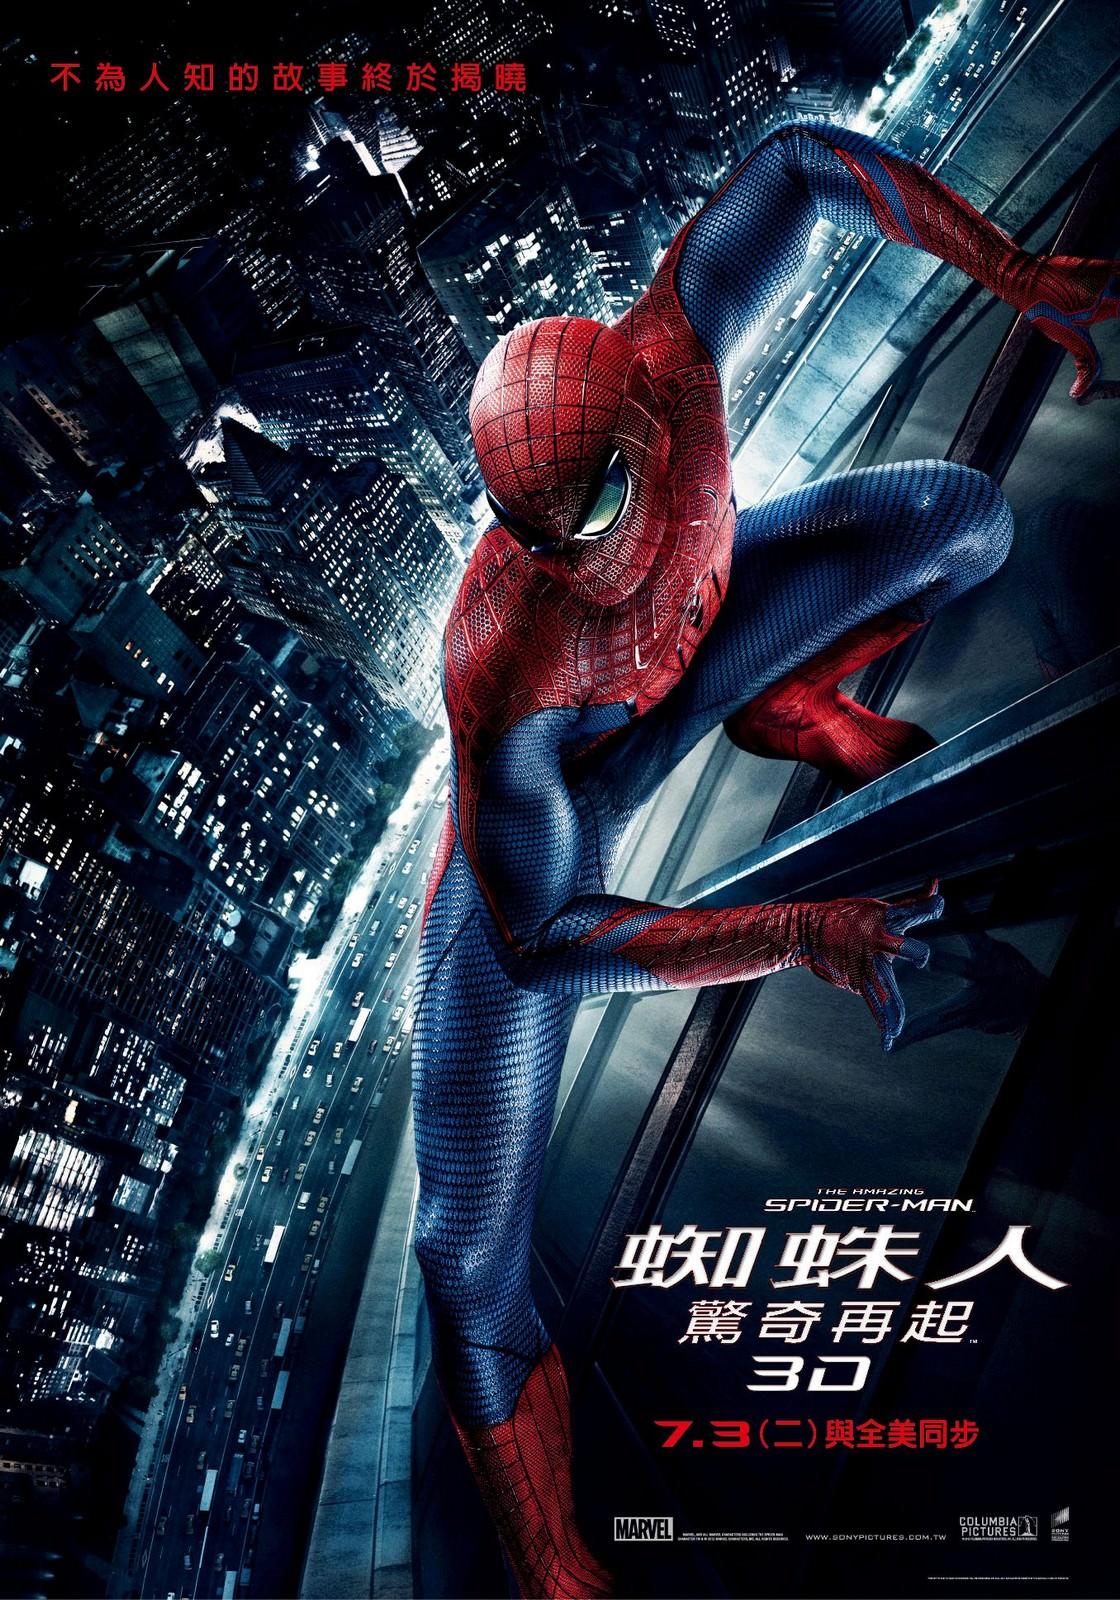 Movie, The Amazing Spider-Man(美國, 2012年) / 蜘蛛人:驚奇再起(台灣) / 超凡蜘蛛侠(中國) / 蜘蛛俠:驚世現新(香港), 電影海報, 台灣